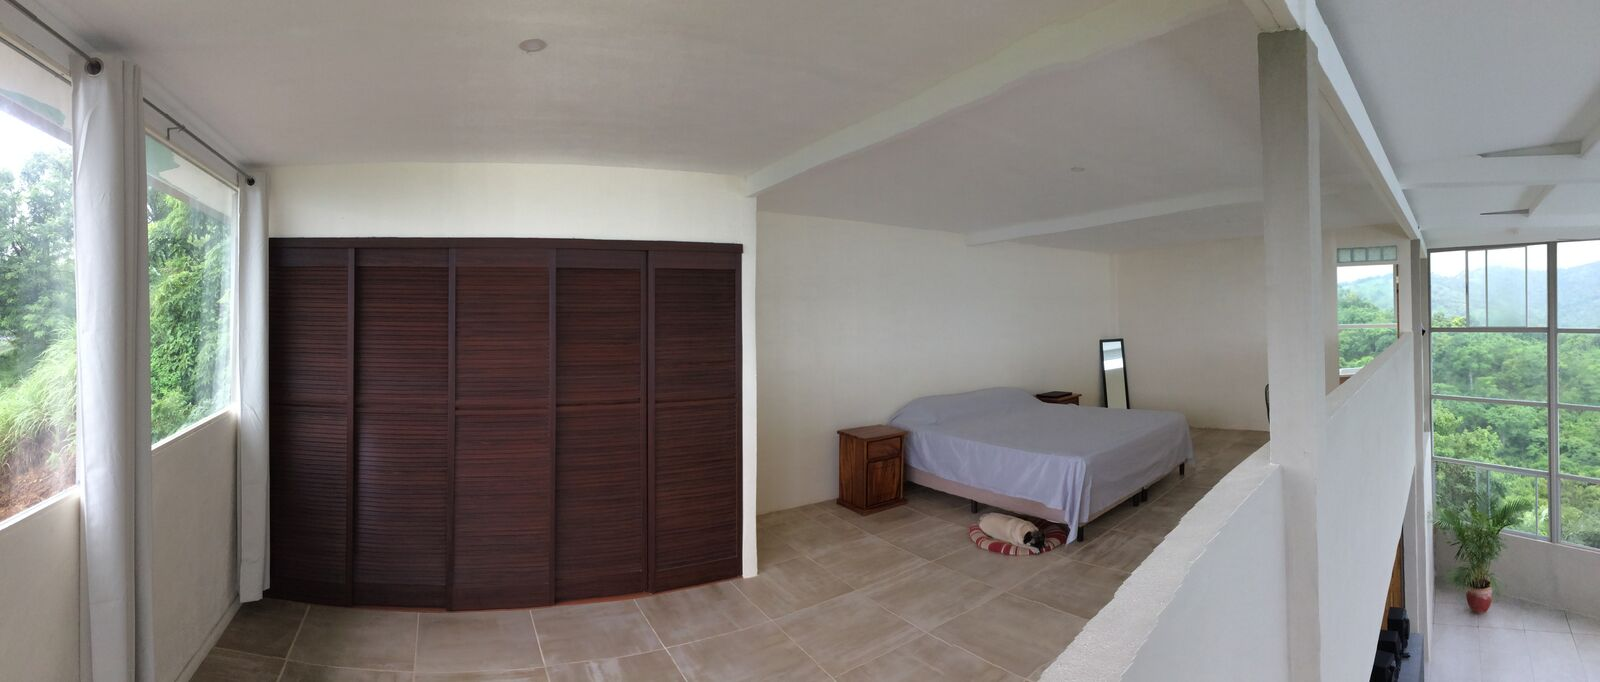 Home For Sale Paradise Bay San Juan Del Sur Nicaragua21.jpg